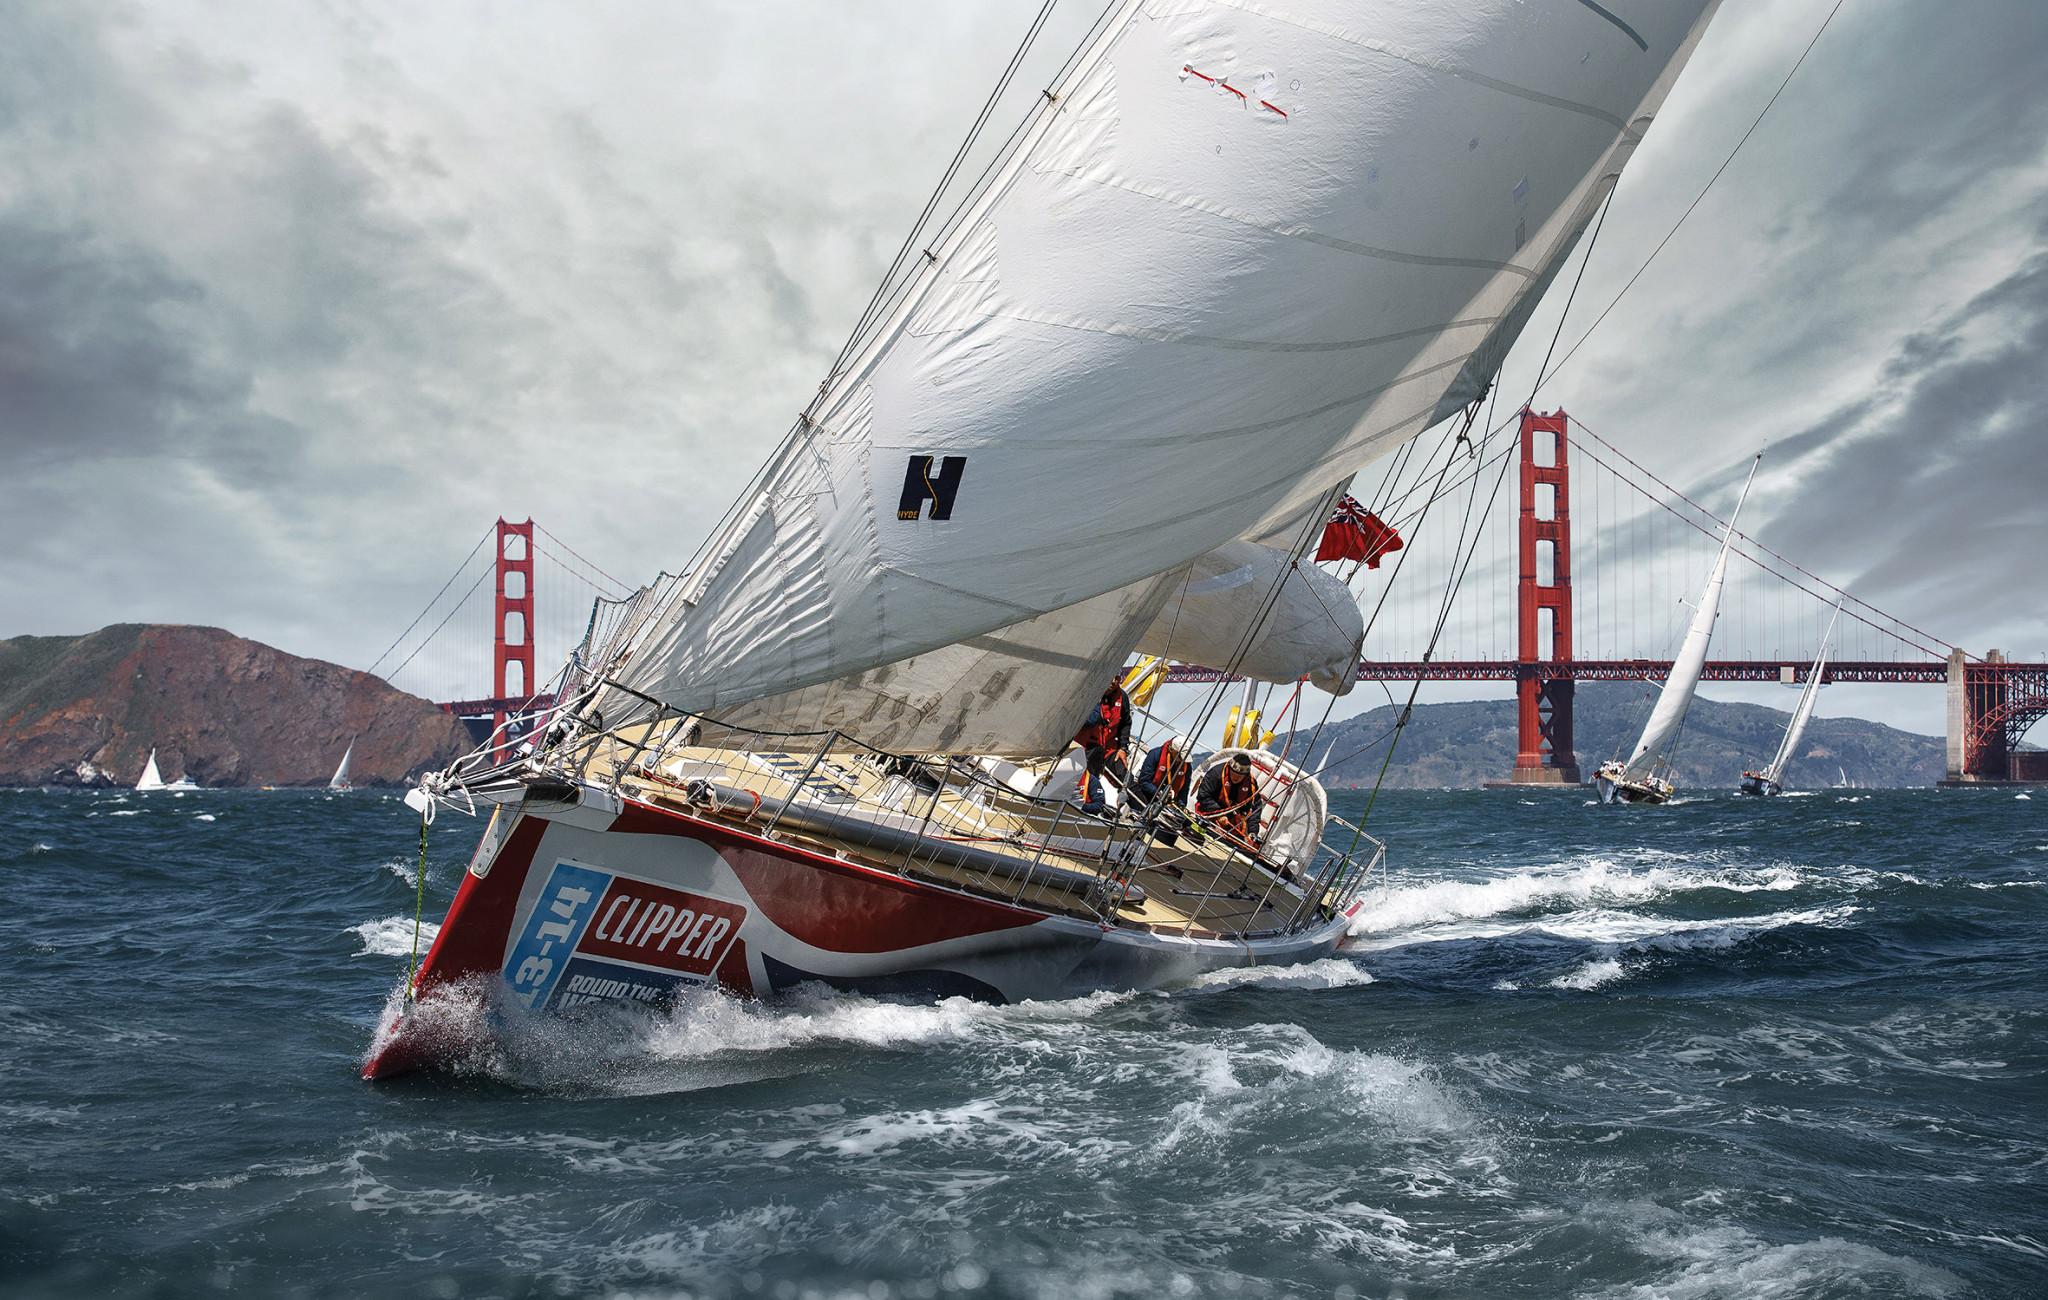 Clipper-Round-the-World-Yacht-Race.jpg